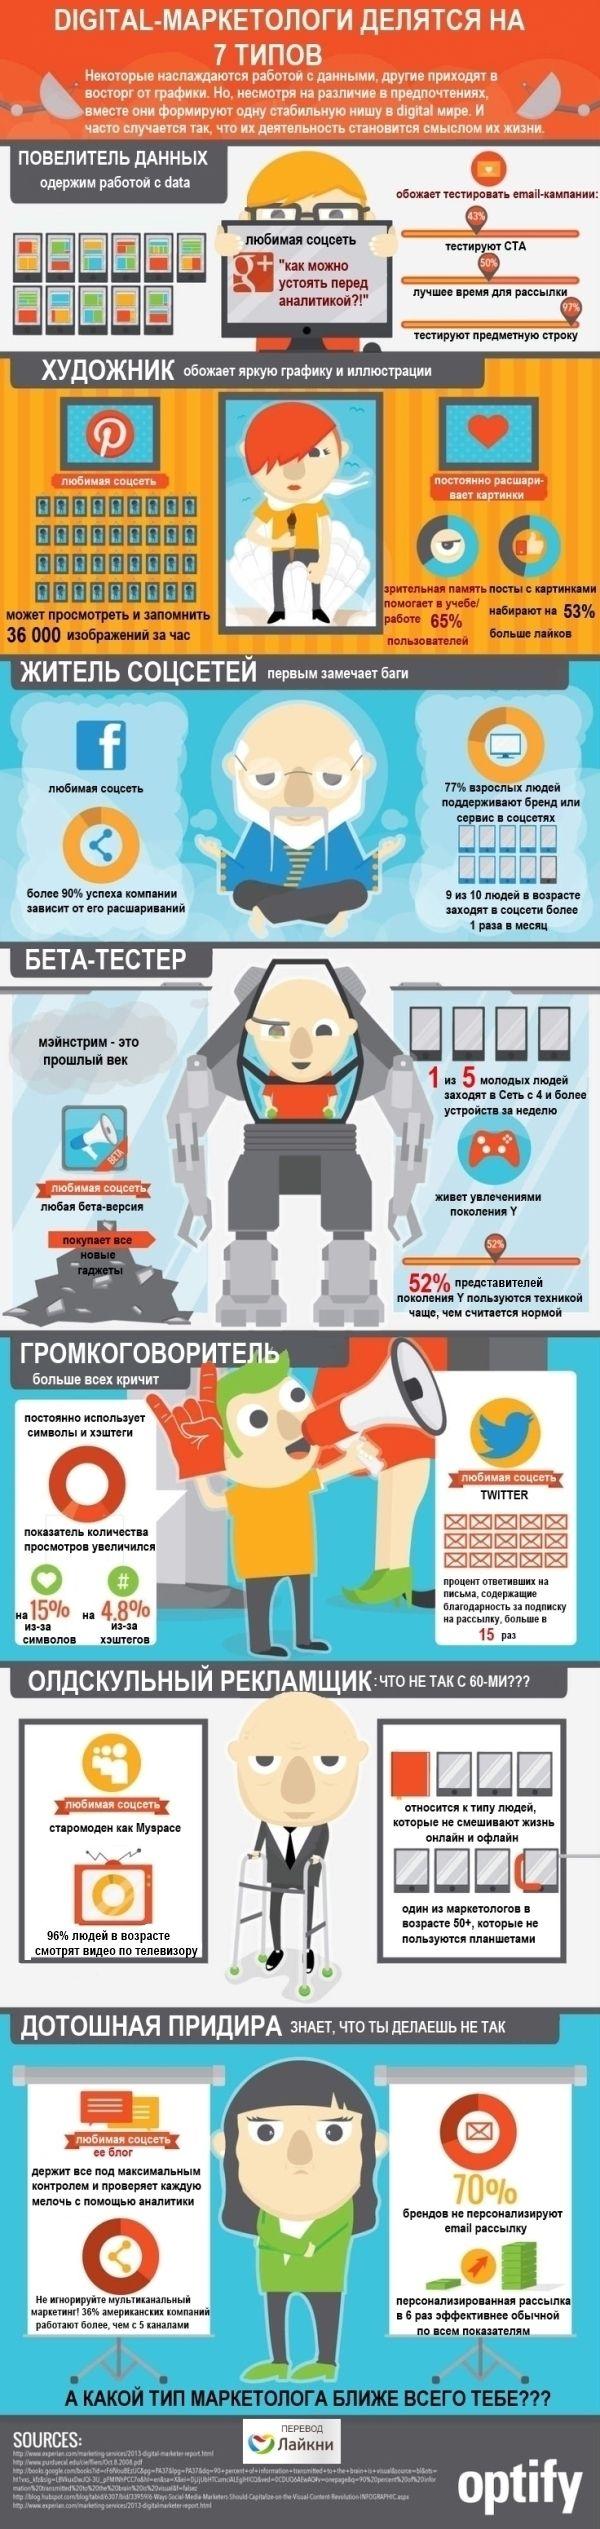 http://statictab.com/yxxo9wo Инфографика: 7 типов digital-маркетологов